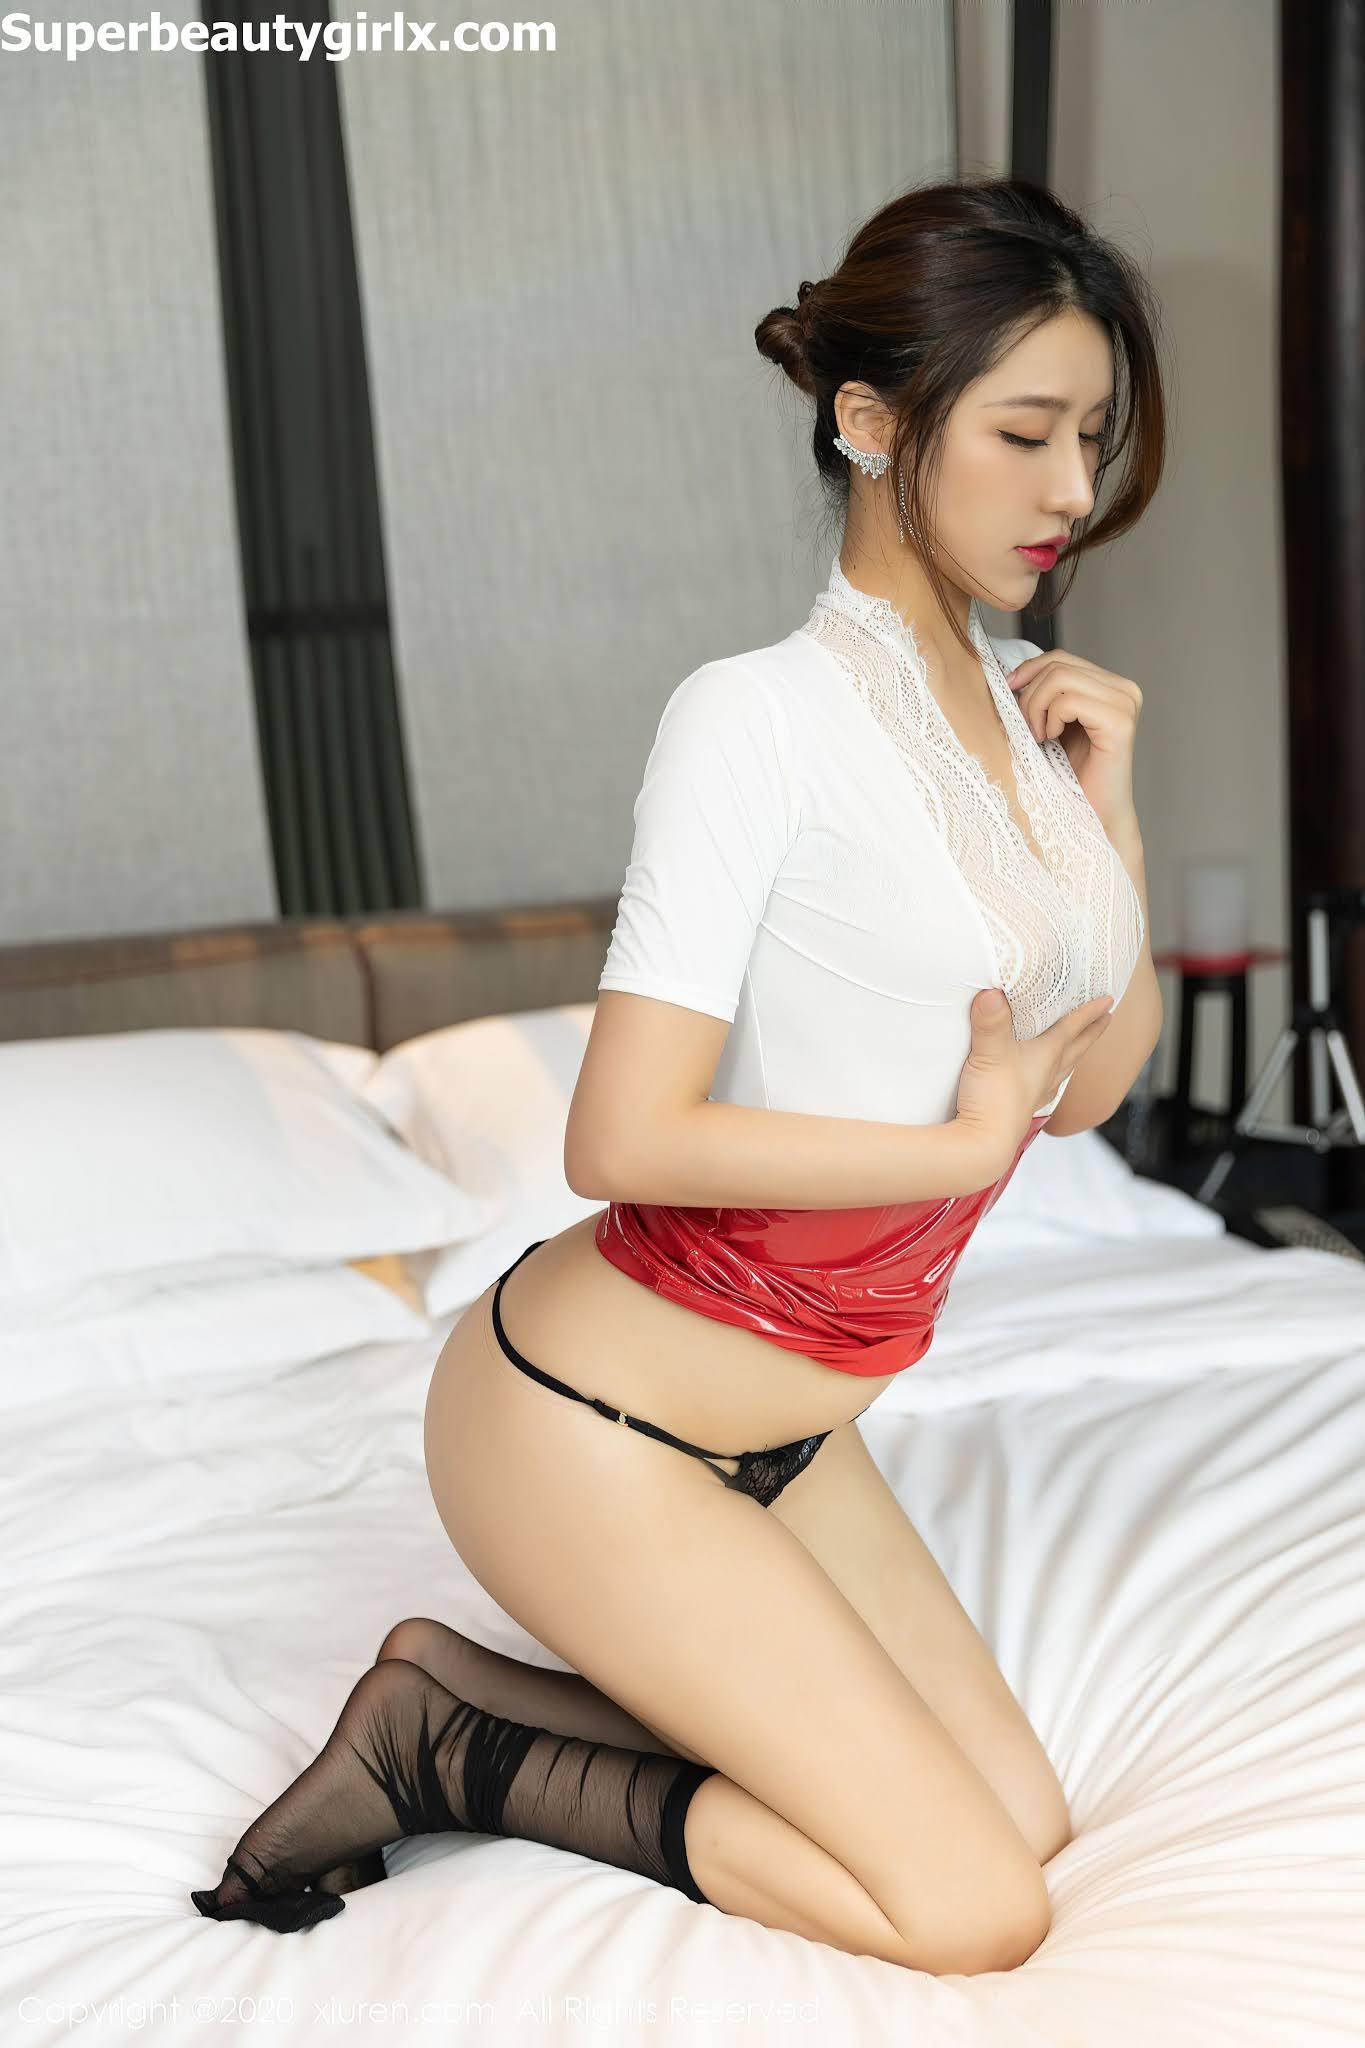 XIUREN-No.2839-Xu-An-An-Superbeautygirlx.com